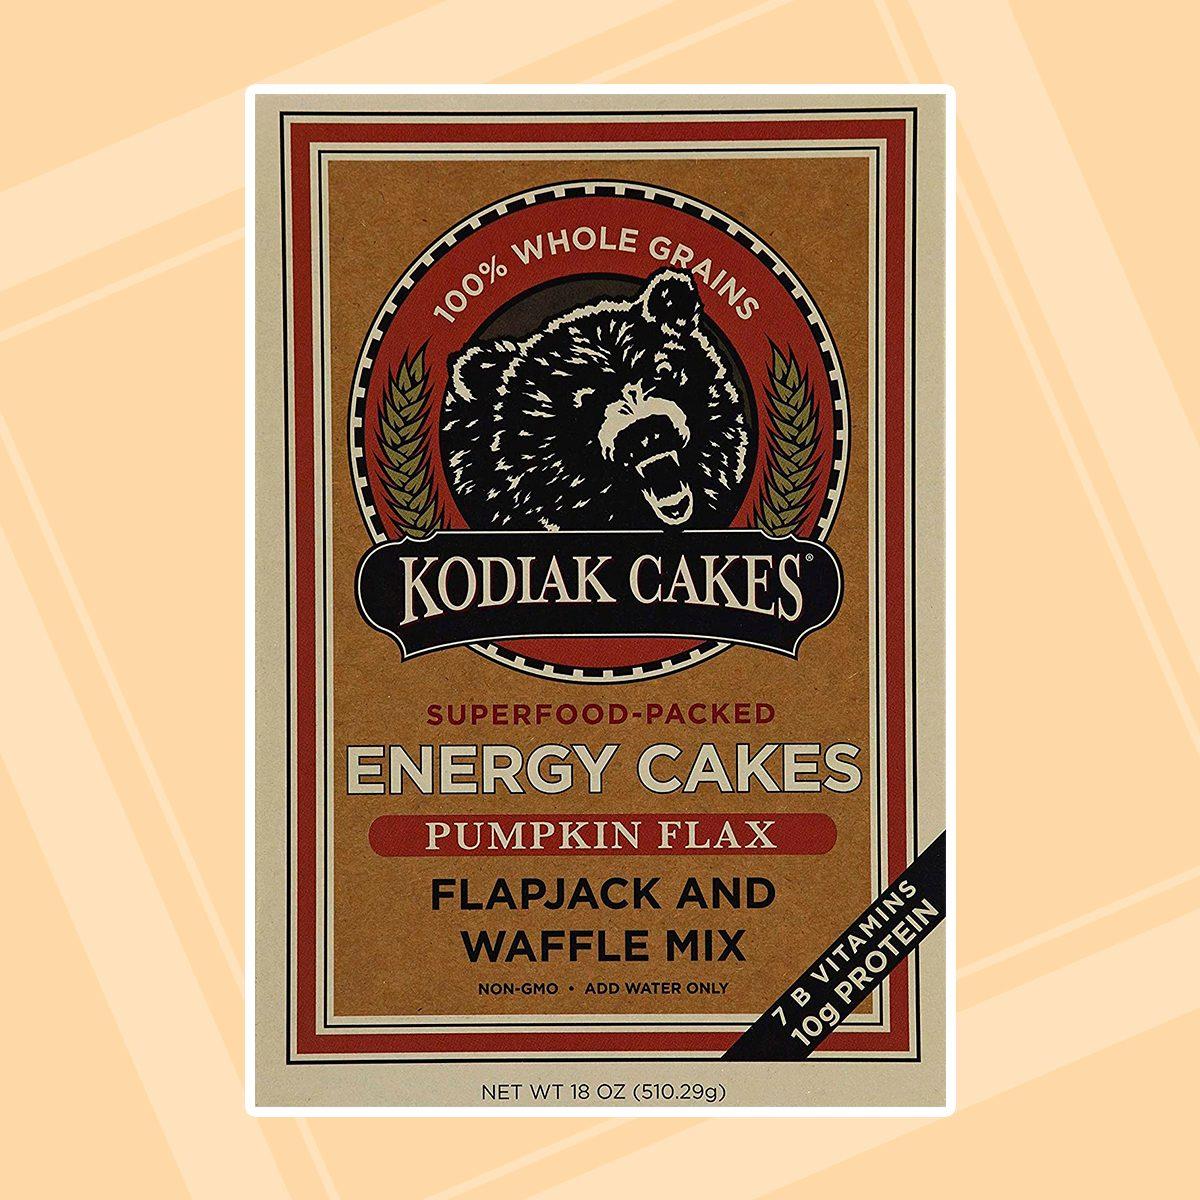 Kodiak Cakes Pumpkin Flax Energy Cakes superfood Protein Packed All Natural, Non GMO Protein Pancake, Flapjack & Waffle Mix 18 oz